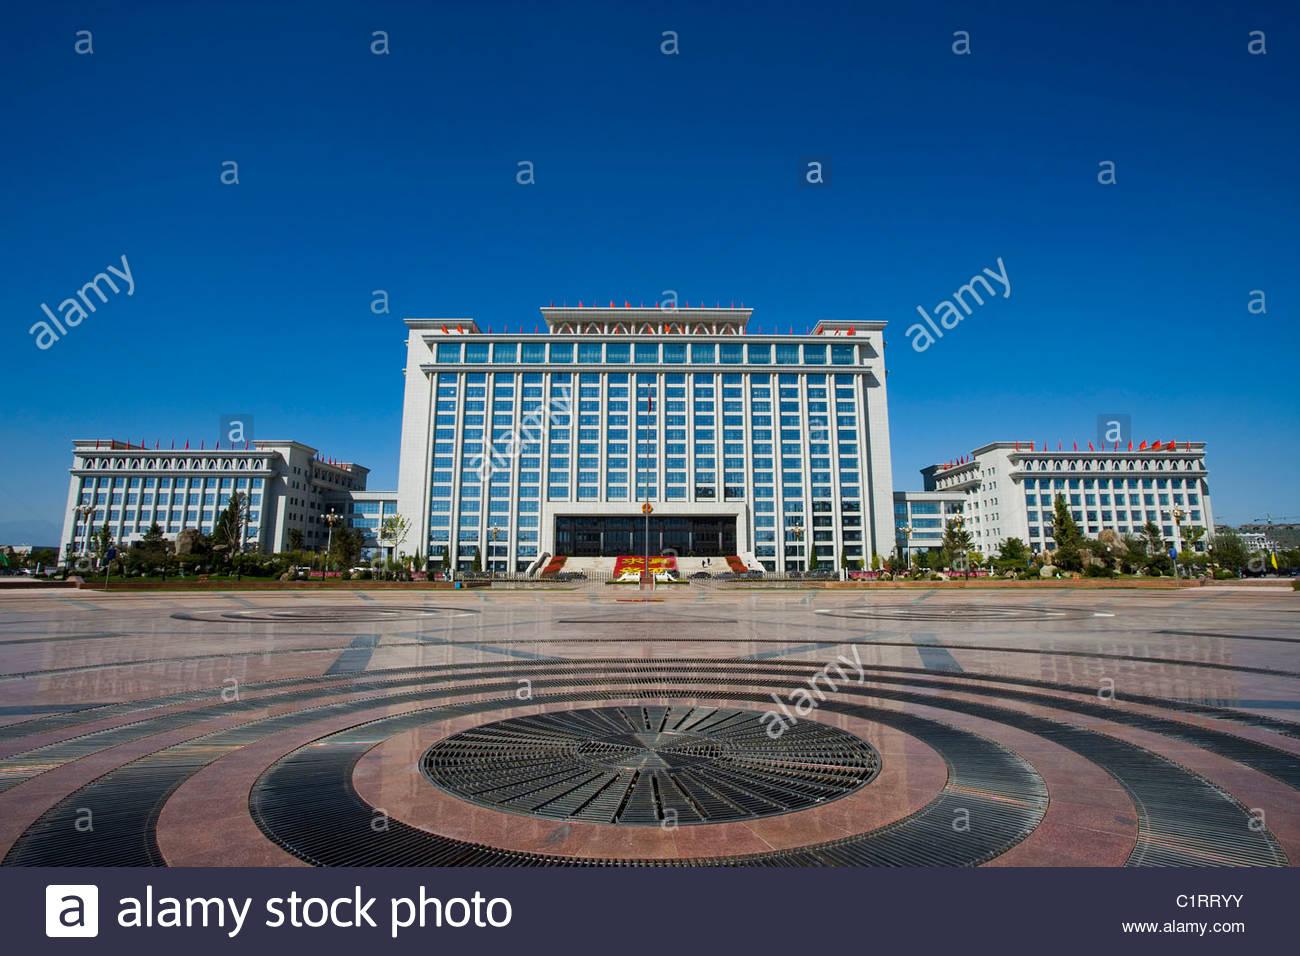 Peoples Square, Yinchuan, Ningxia Hui Autonomous Region, China Stock Photo